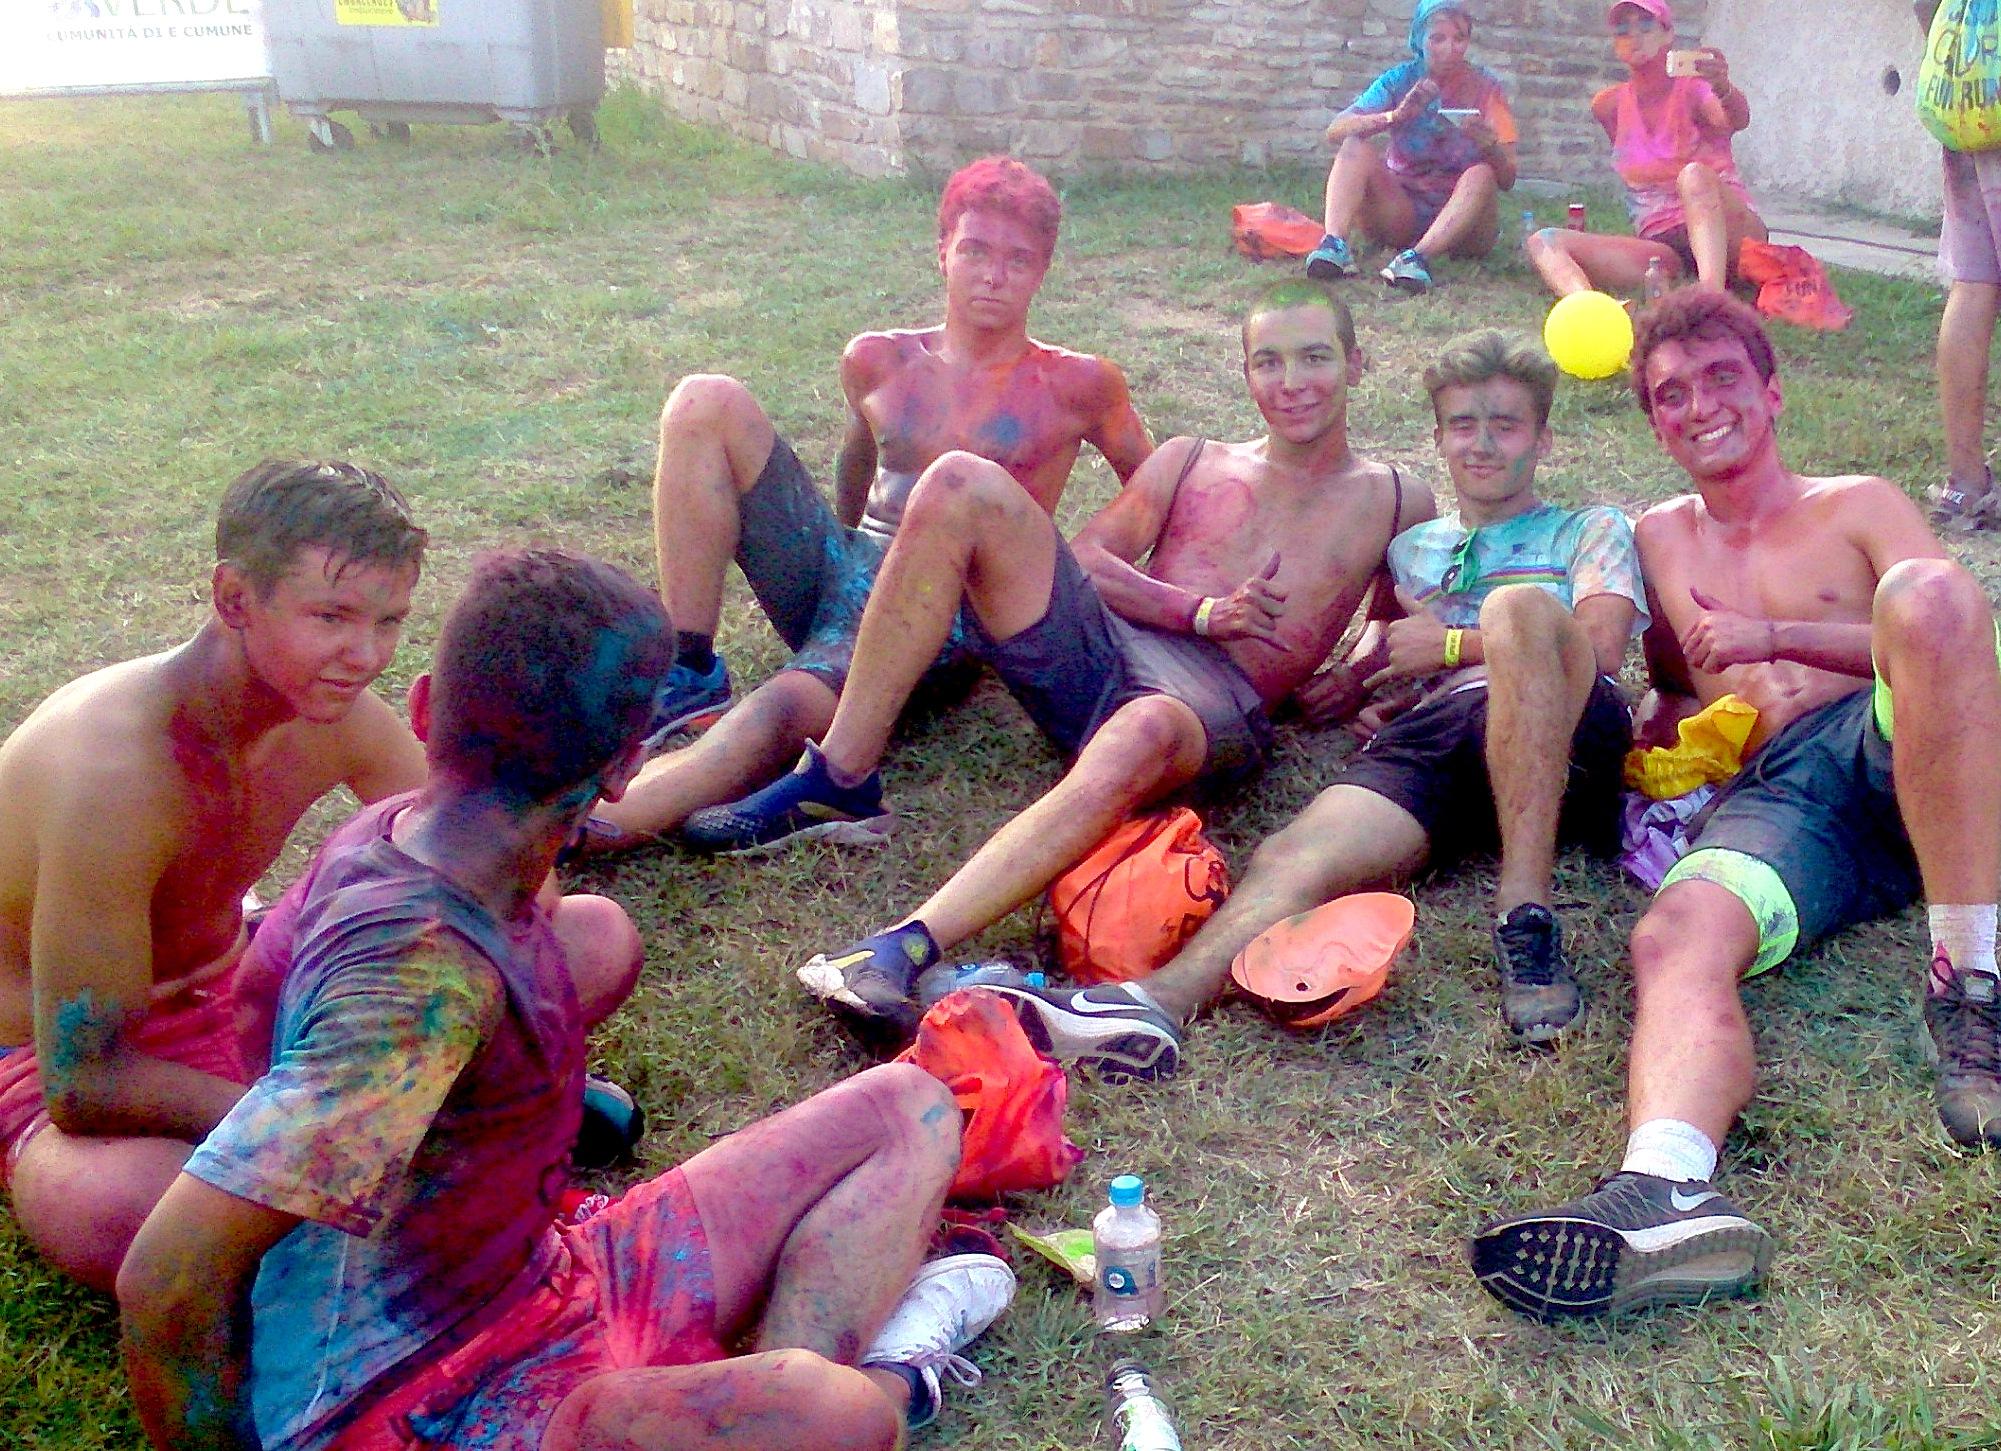 Poggio-Mezzana: Réussite pleine de couleurs pour la 2ème «Corsica color fun run»